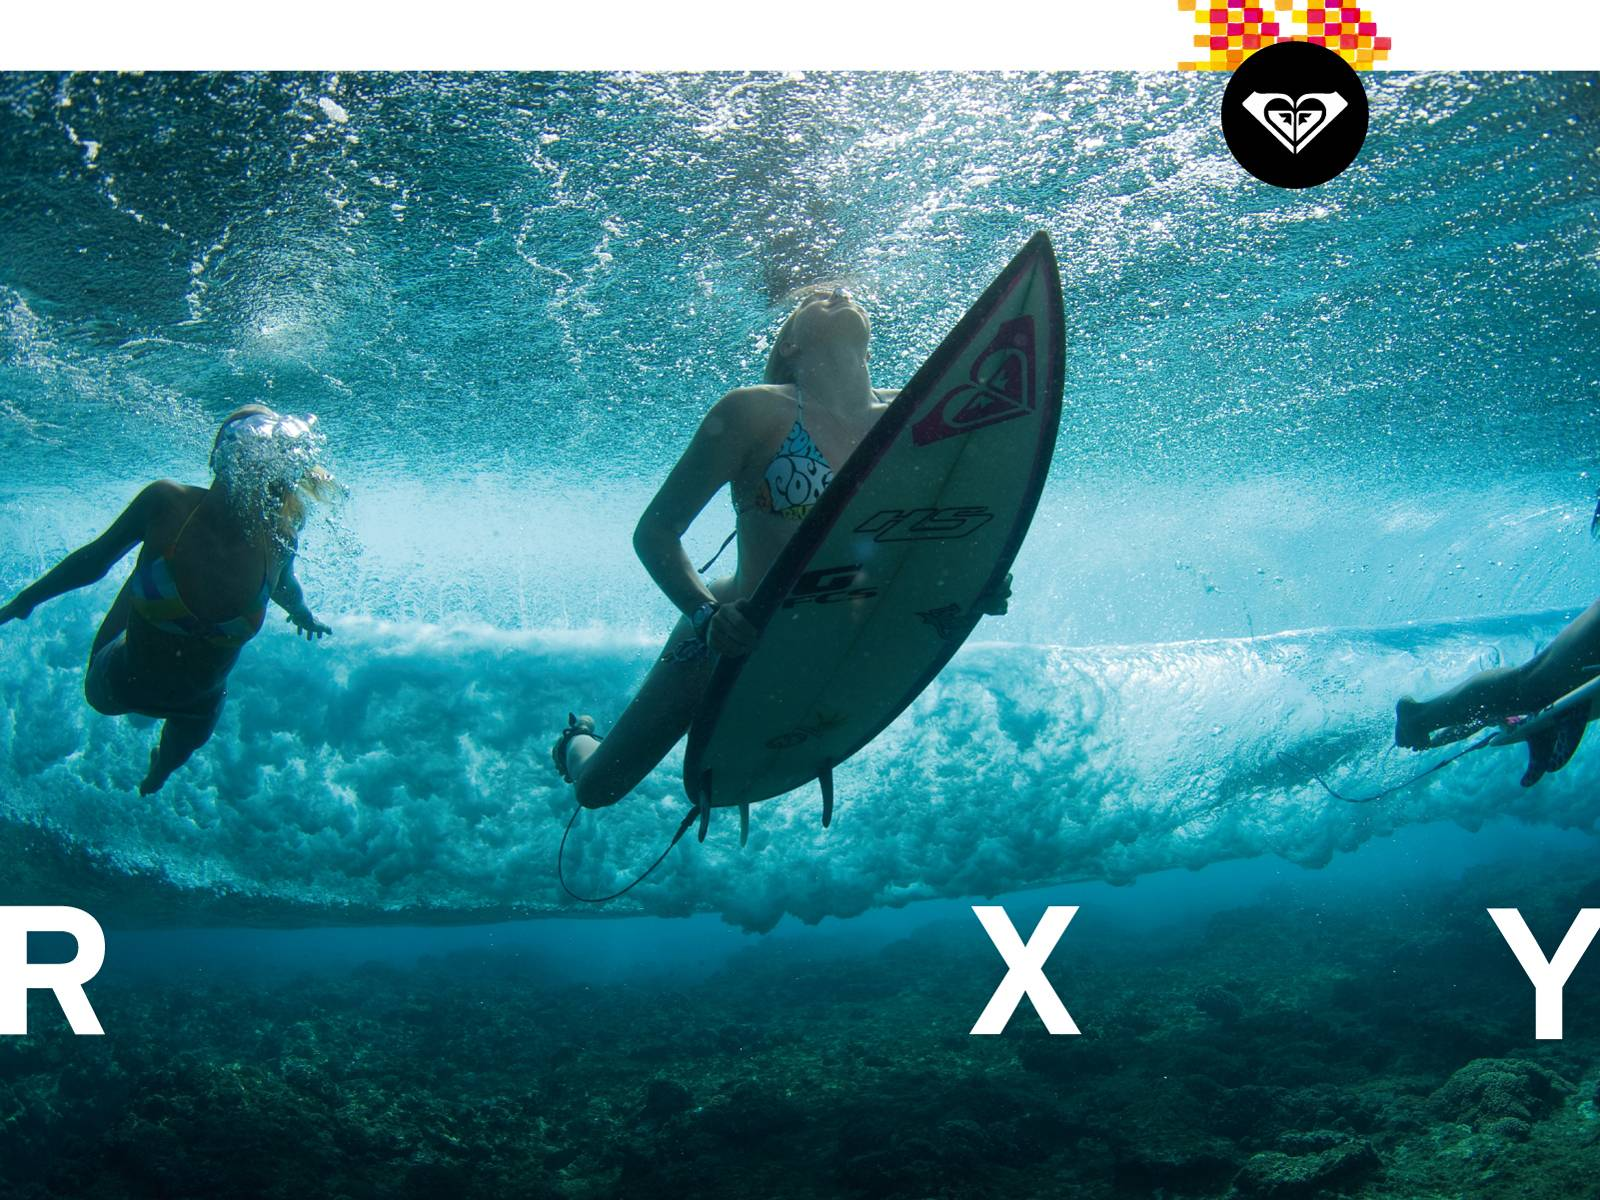 winter surfing roxy wallpaper - photo #5